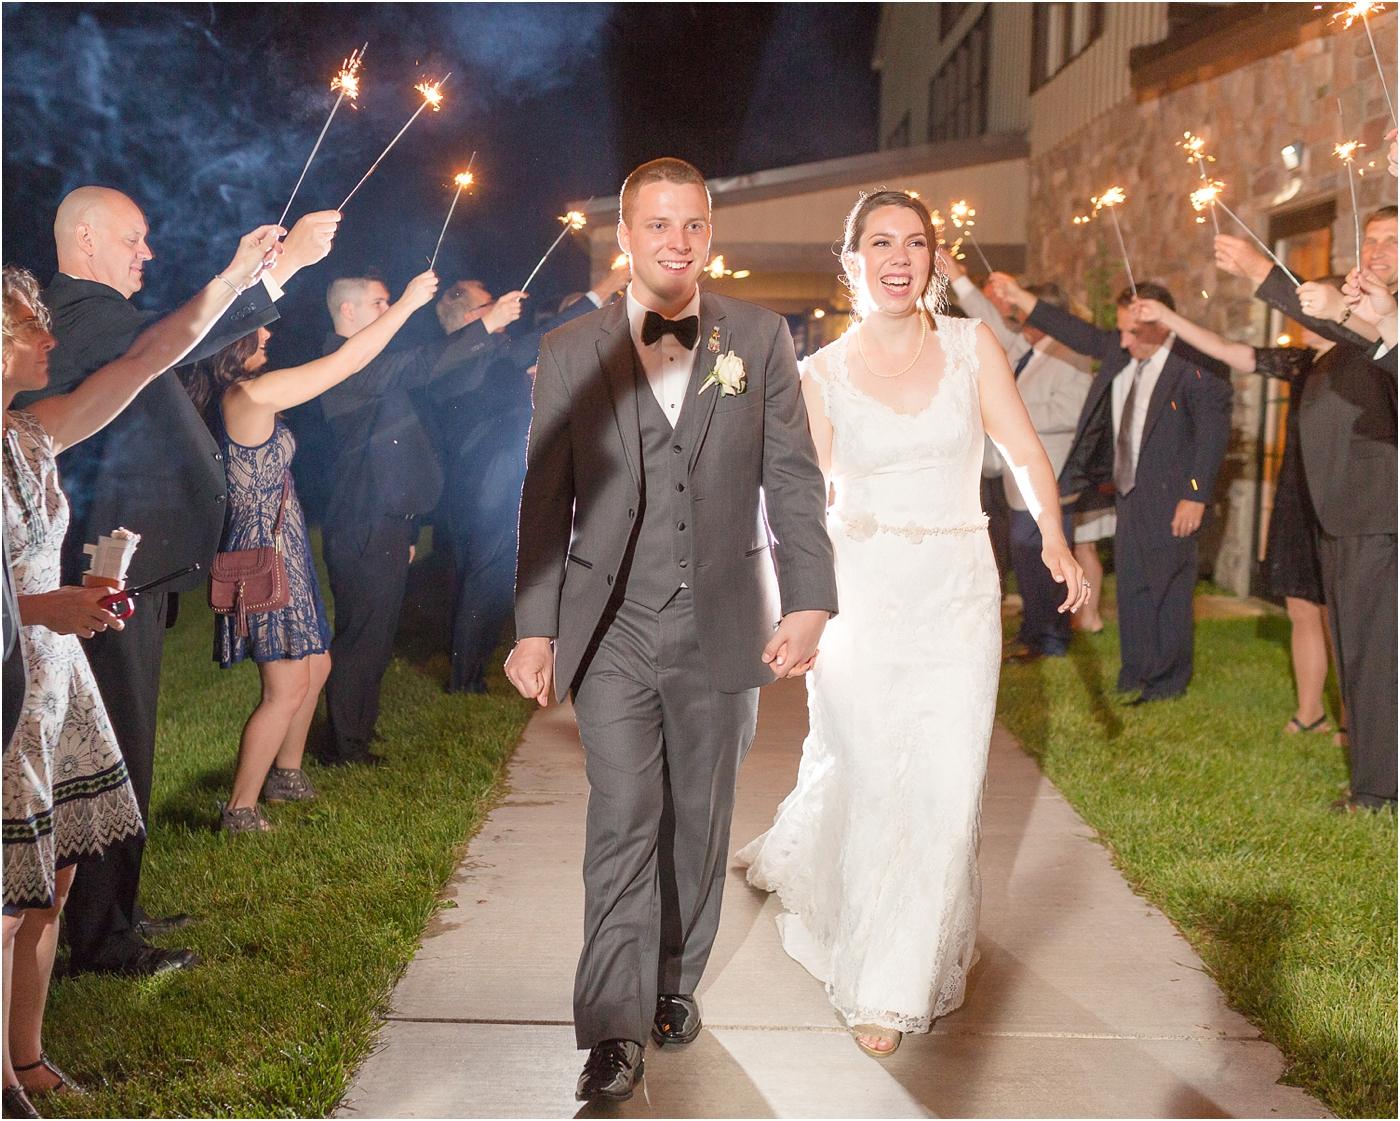 Gettysburg-lodges-wedding-photos-125.jpg